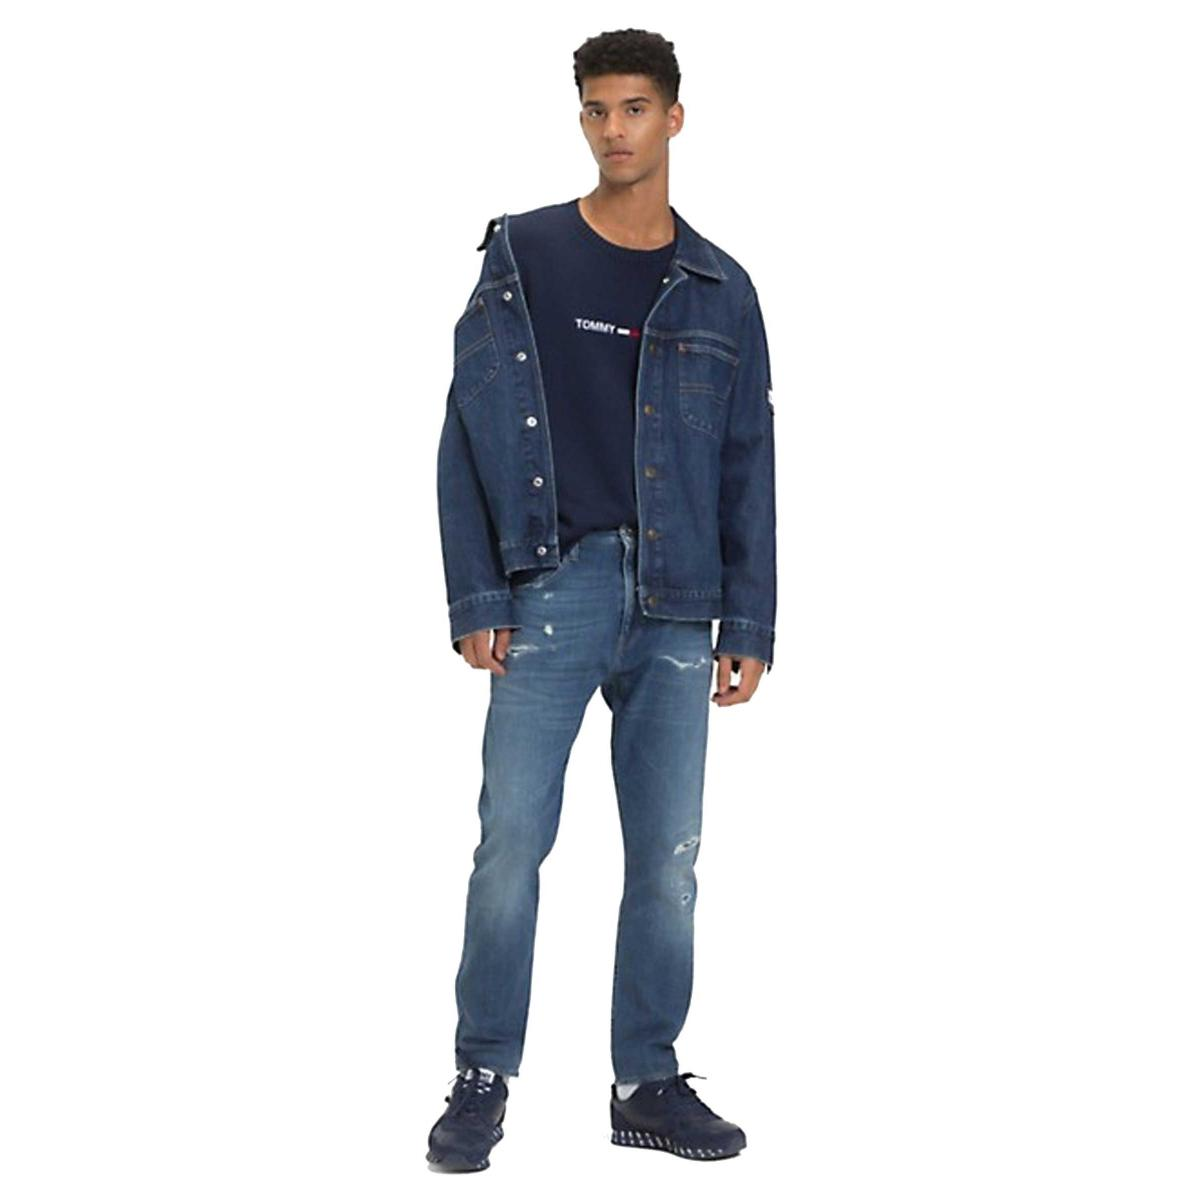 Giacca giubbotto Tommy Jeans Oversize Trucker SL da uomo rif. DM0DM05824